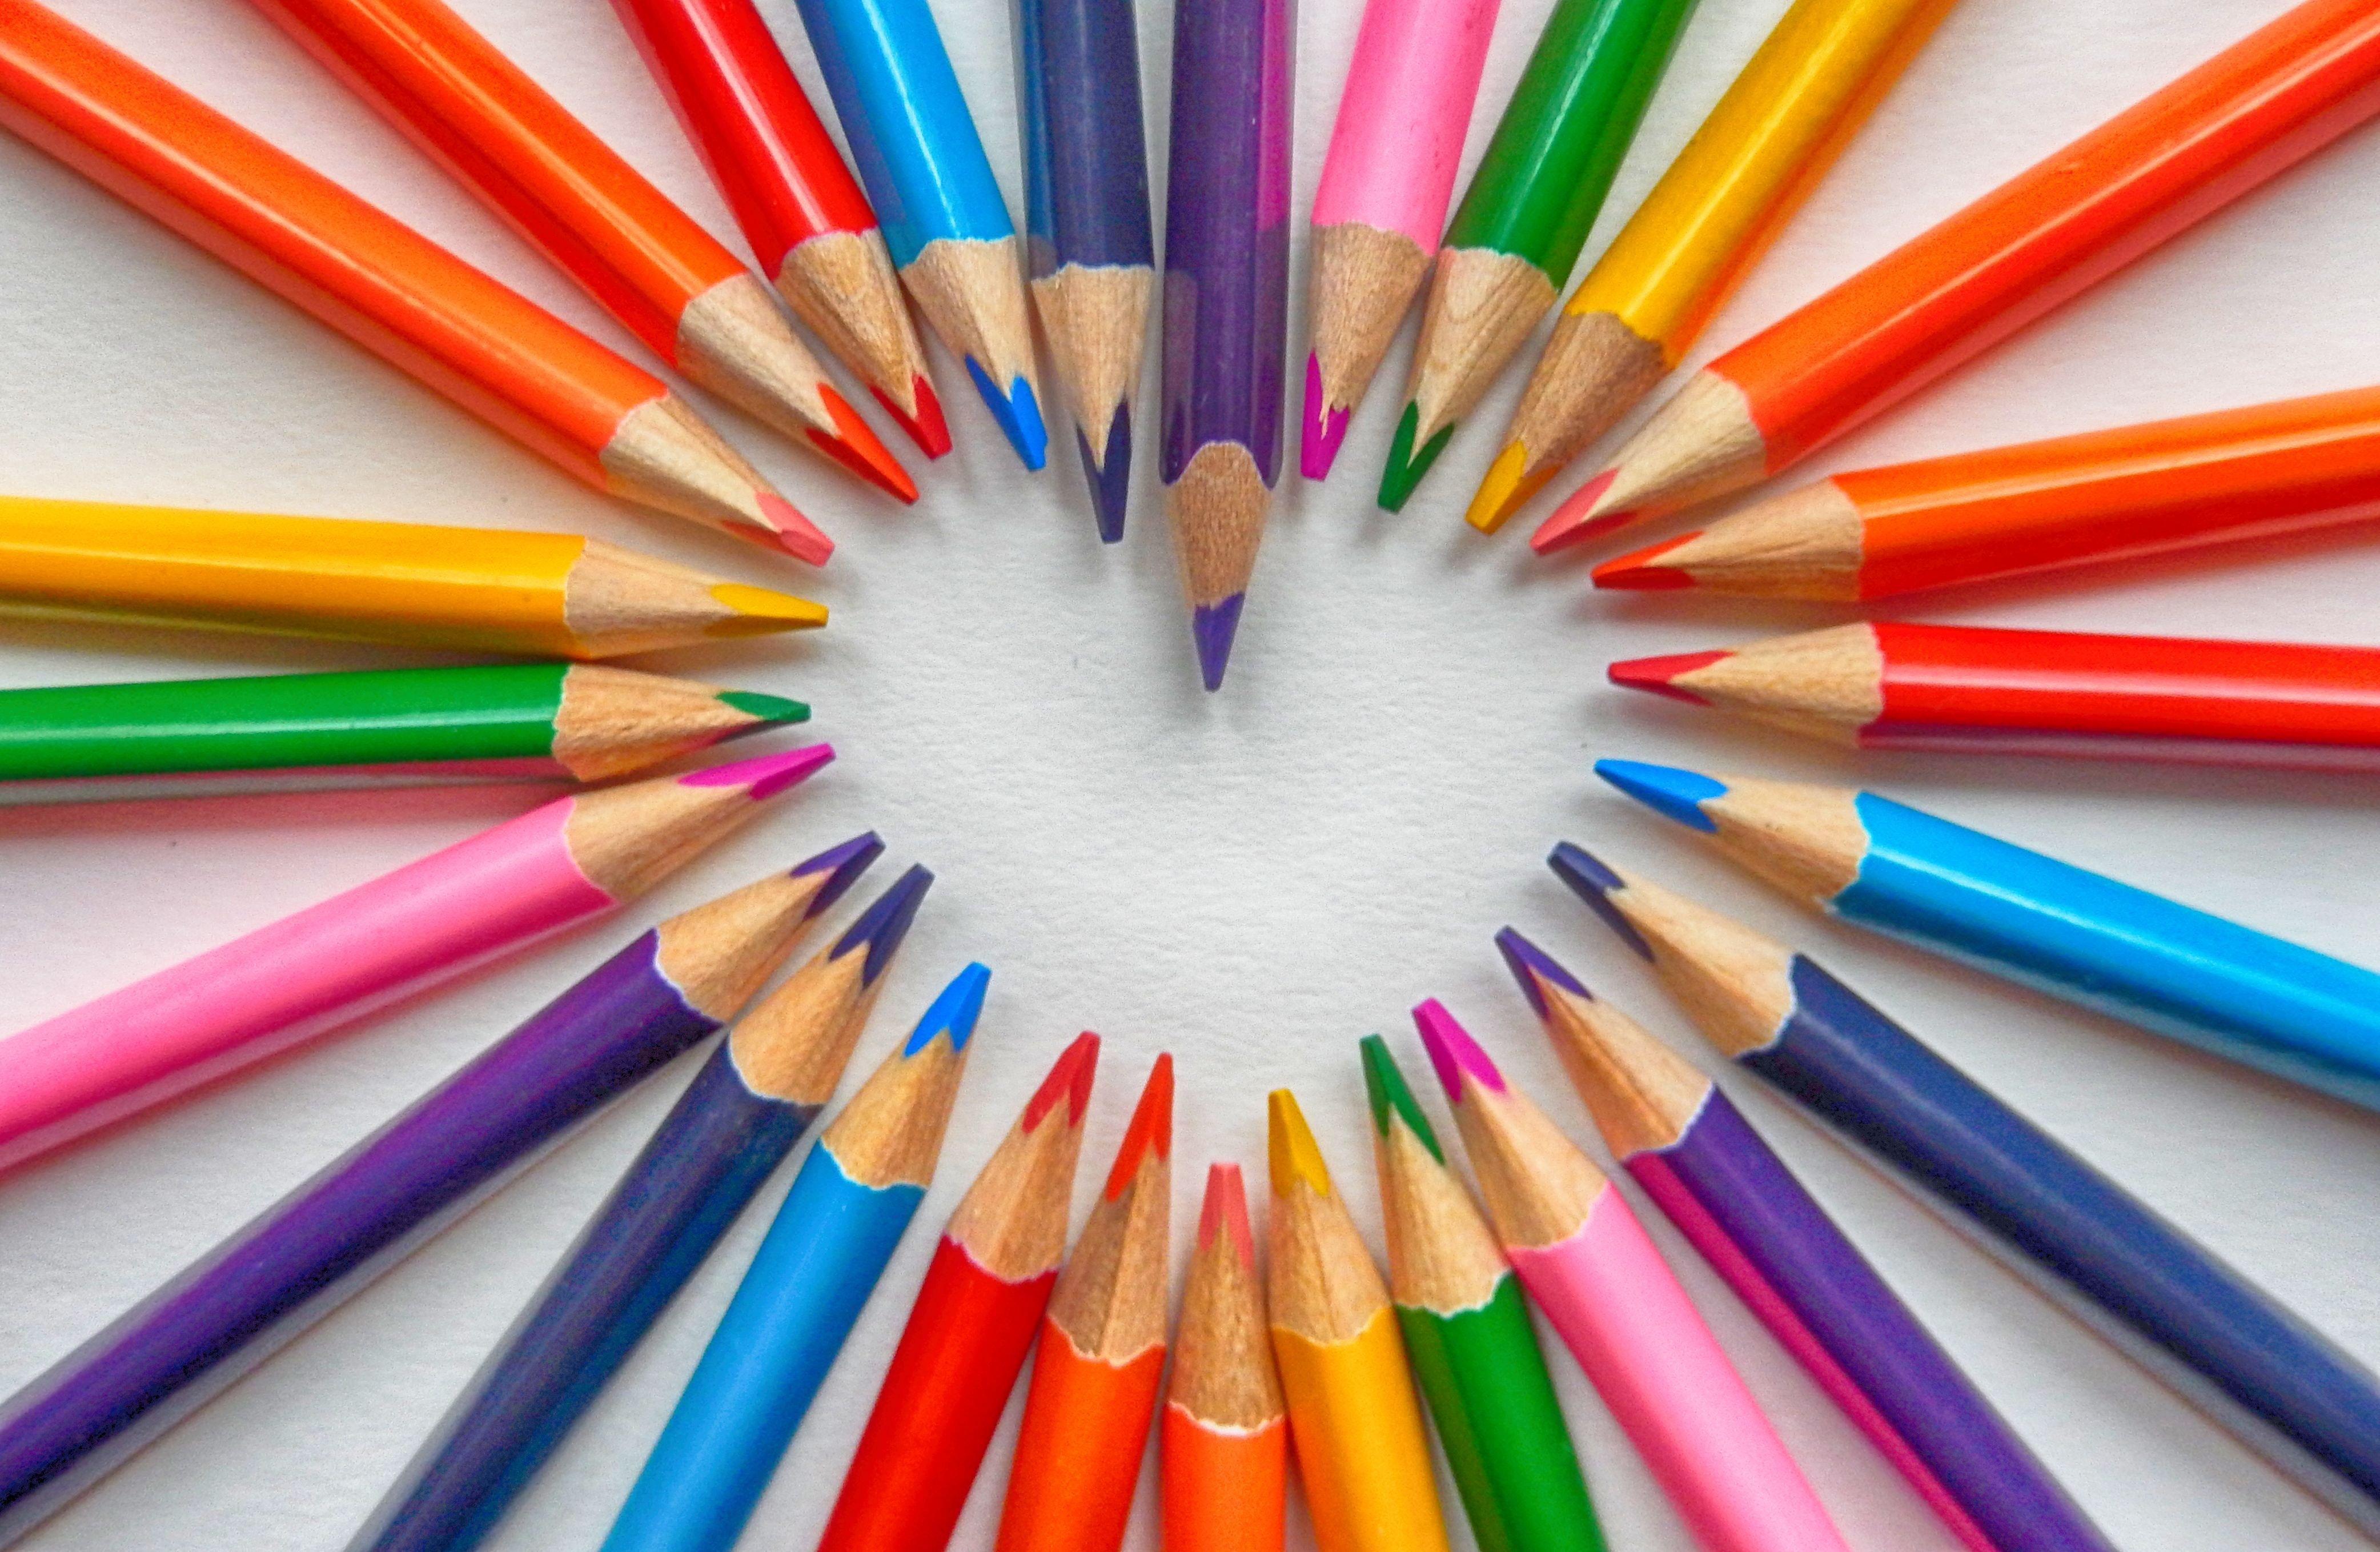 vibrant pencils creativity transition expat nest